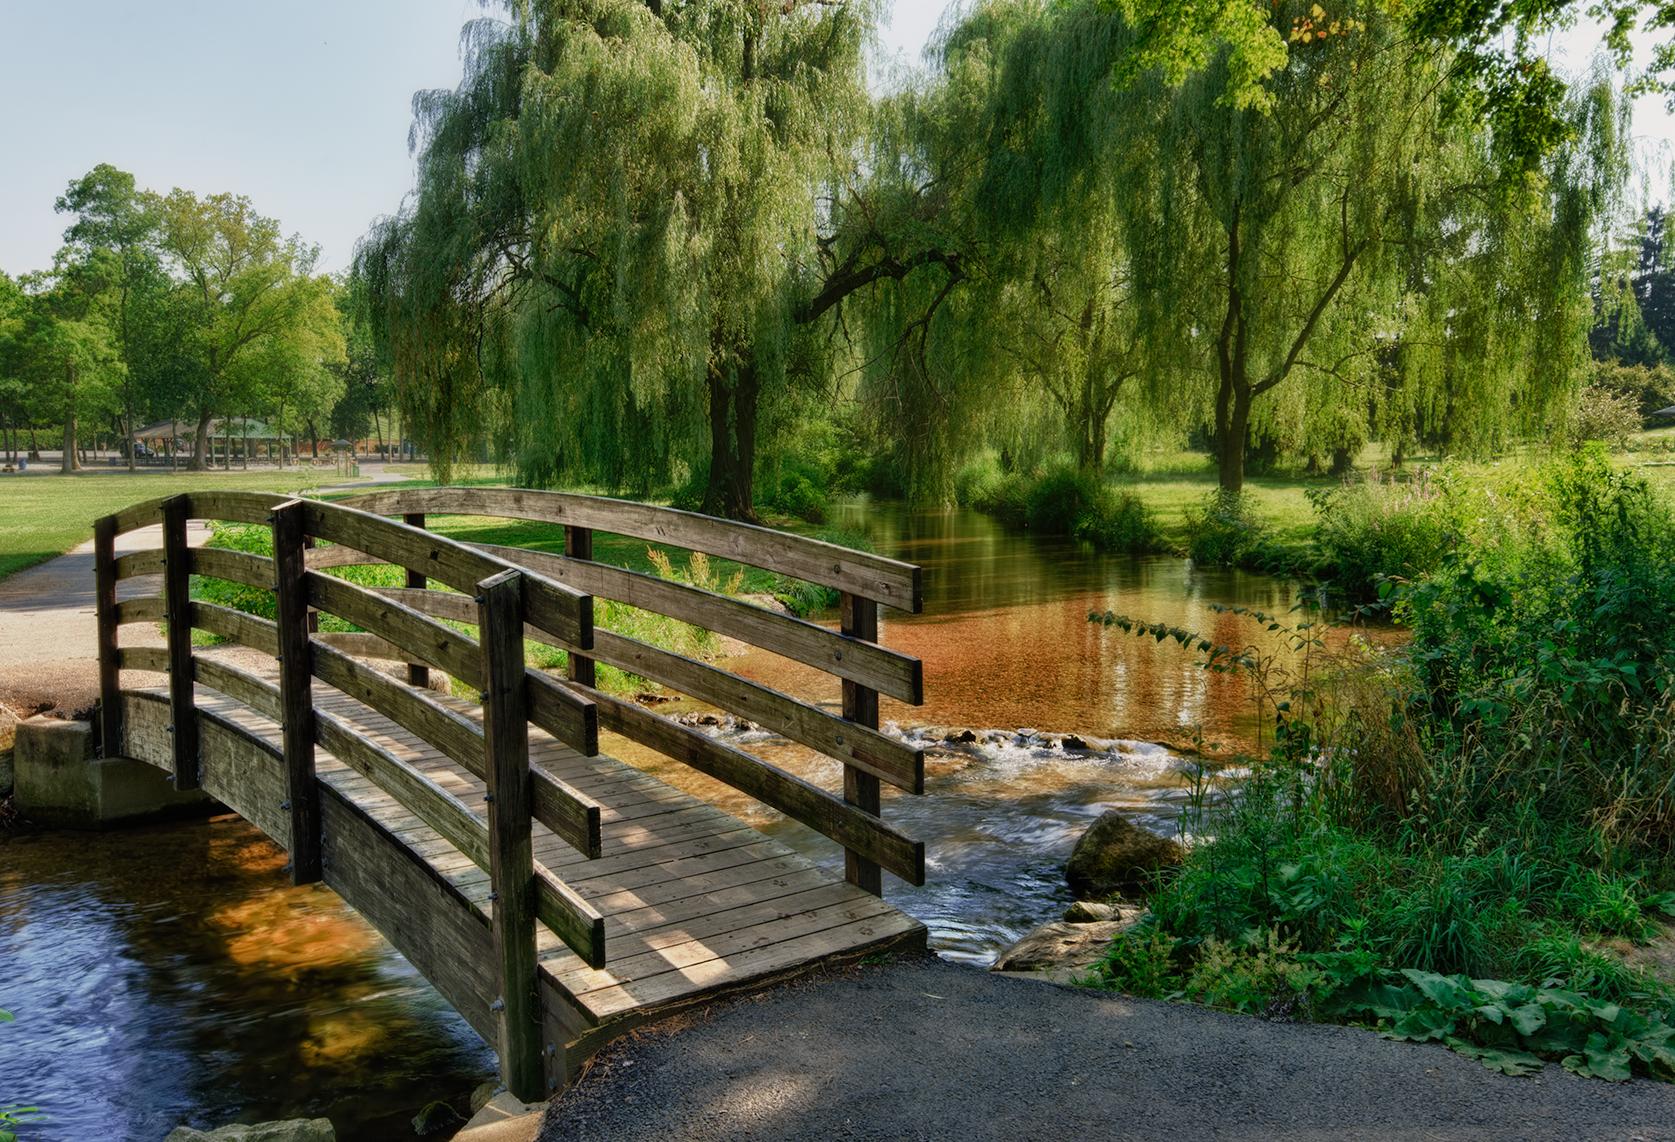 Cedar_Creek_Park_2012-07-06_-10_HDR-Edit.jpg